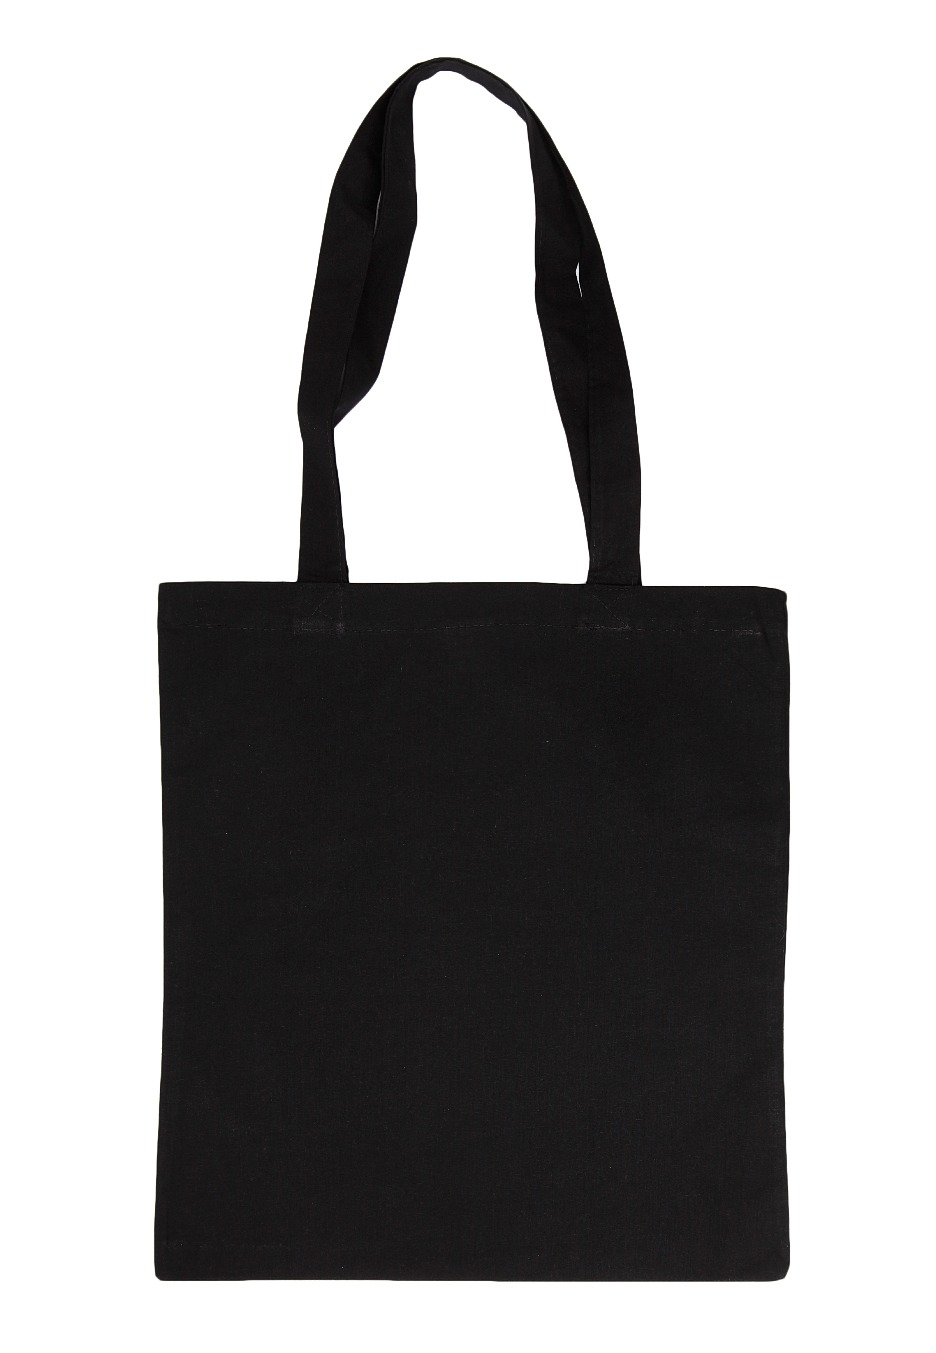 Mit Verachtung... - Musik war meine Idee - Tote Bag - Streetwear ... 8e50bde8dab54